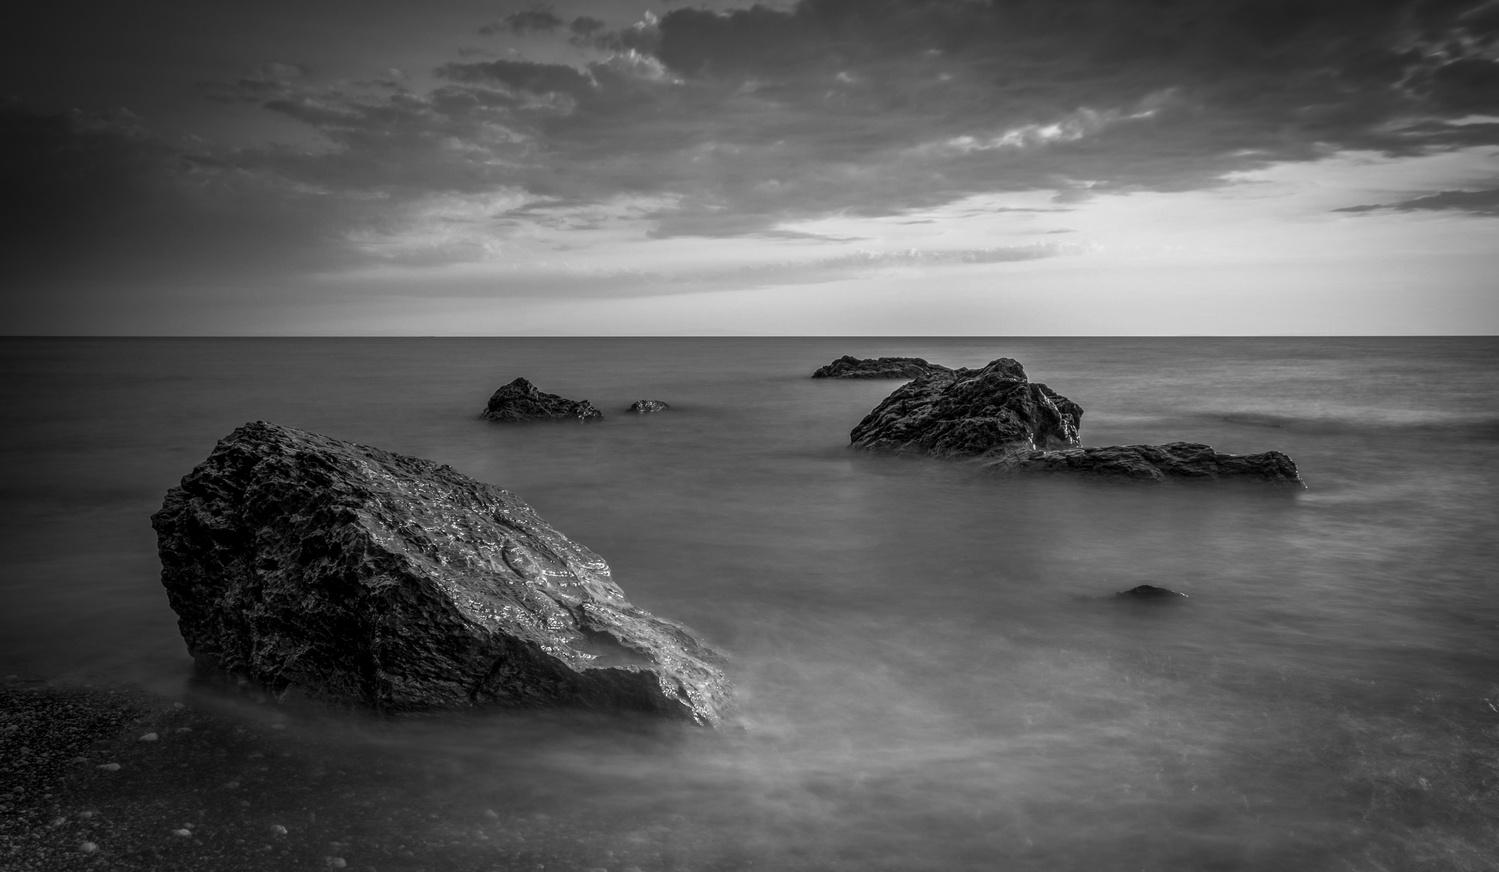 Seascape by Alexander Staridas